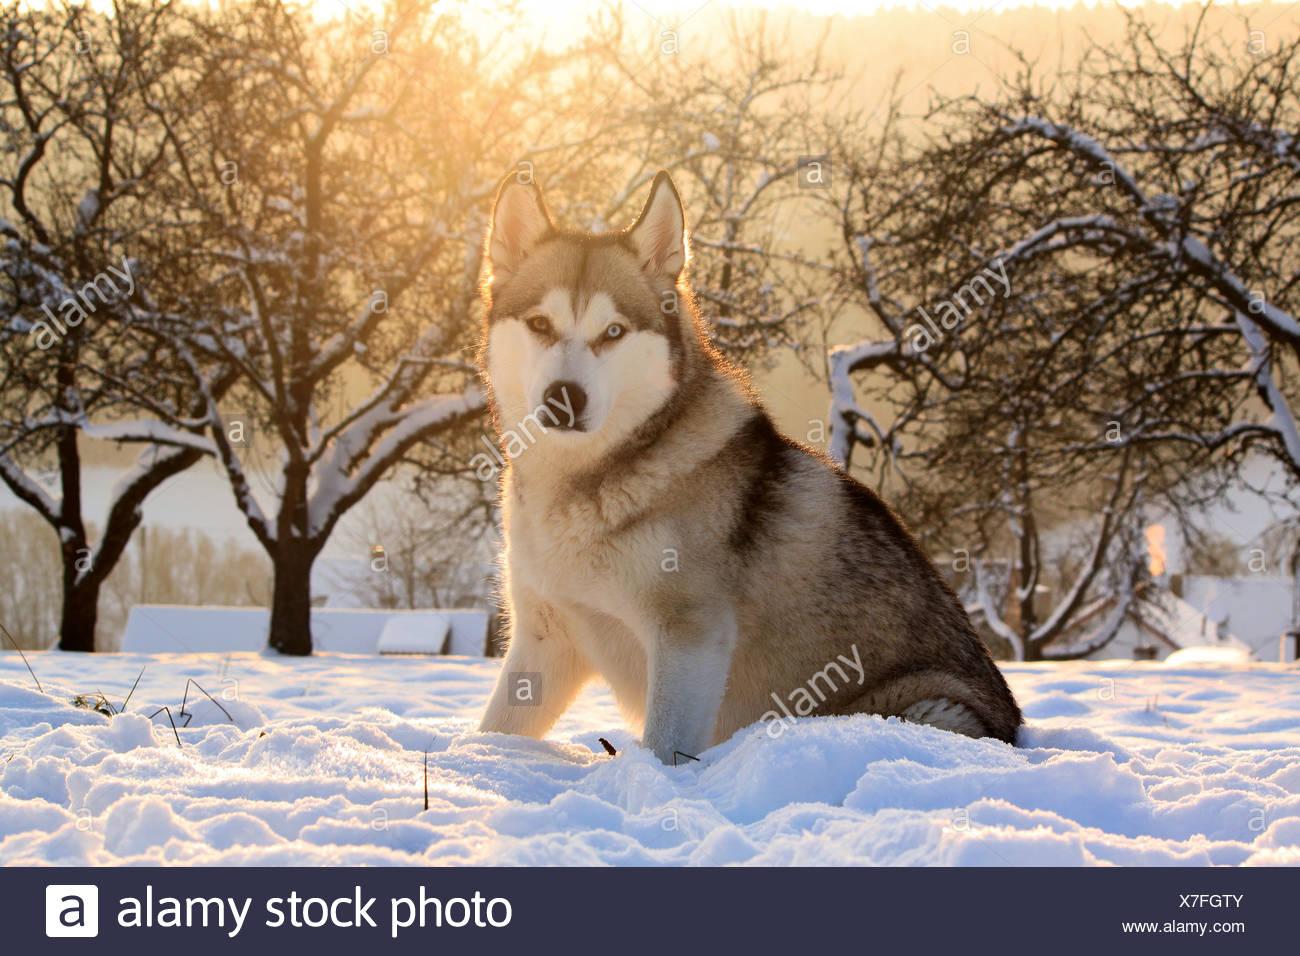 Siberian Husky Dog In Snow Stock Photo 280011003 Alamy